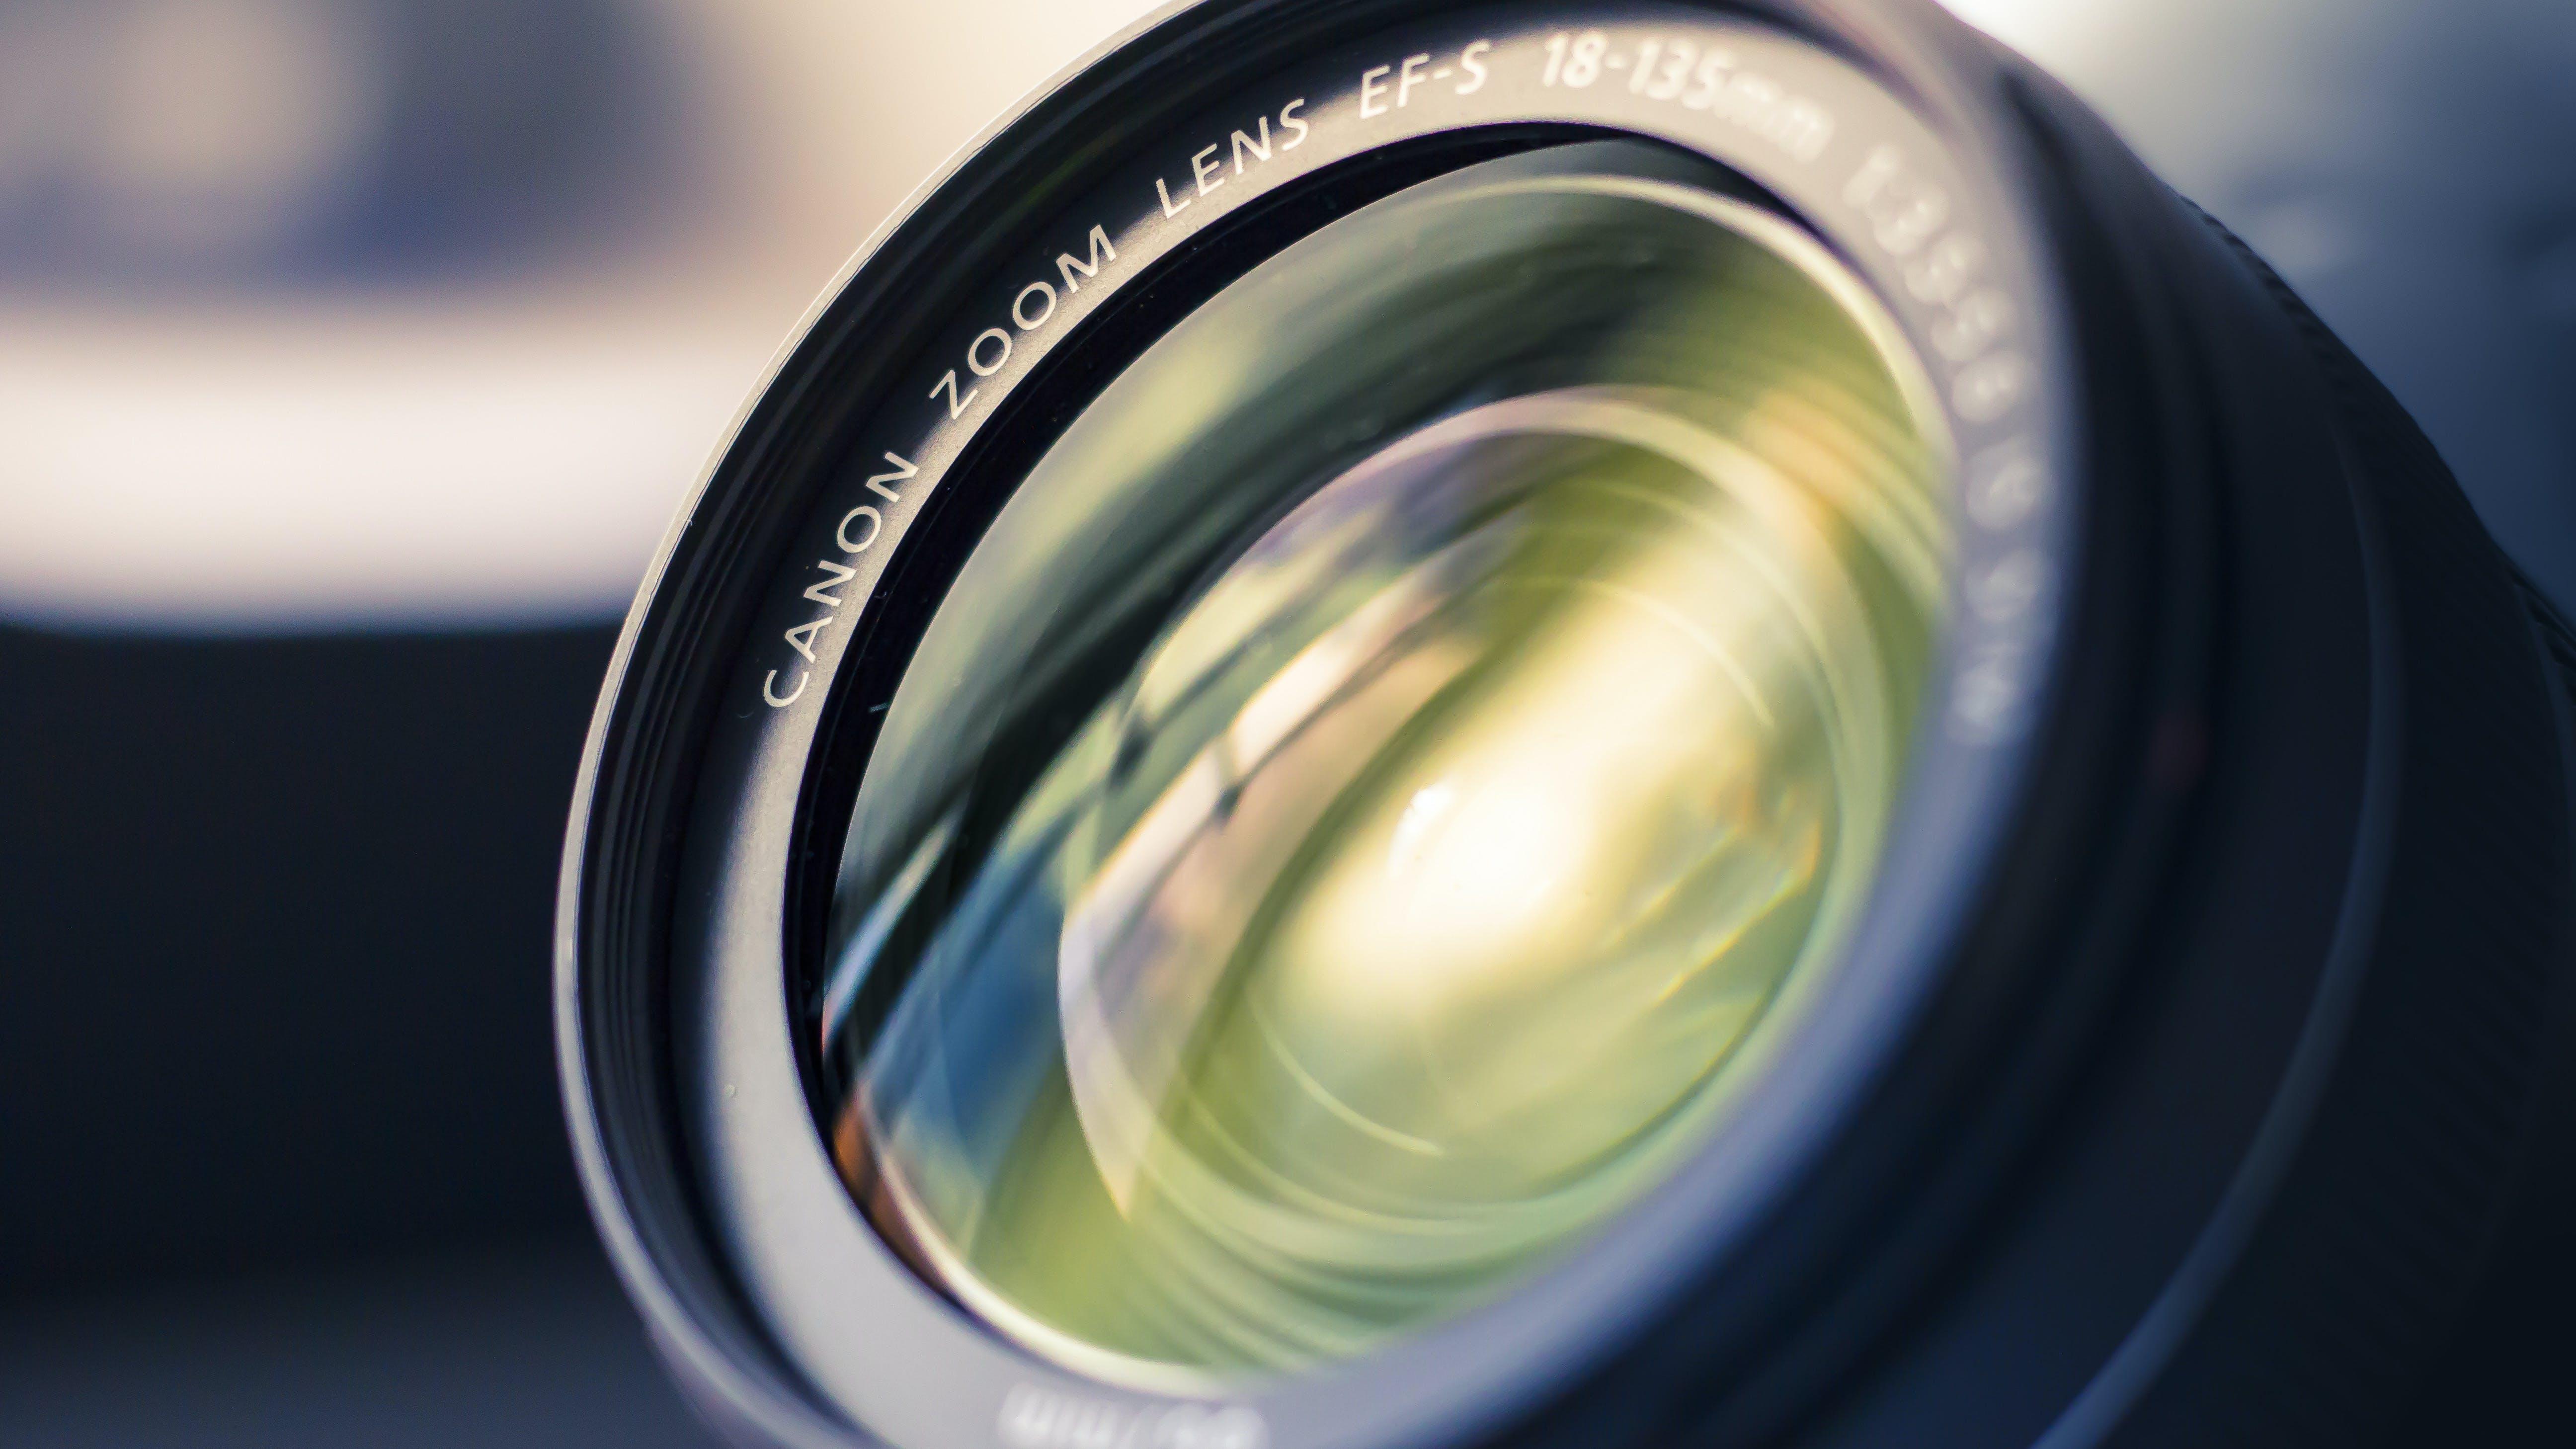 Canon Zoom Lens